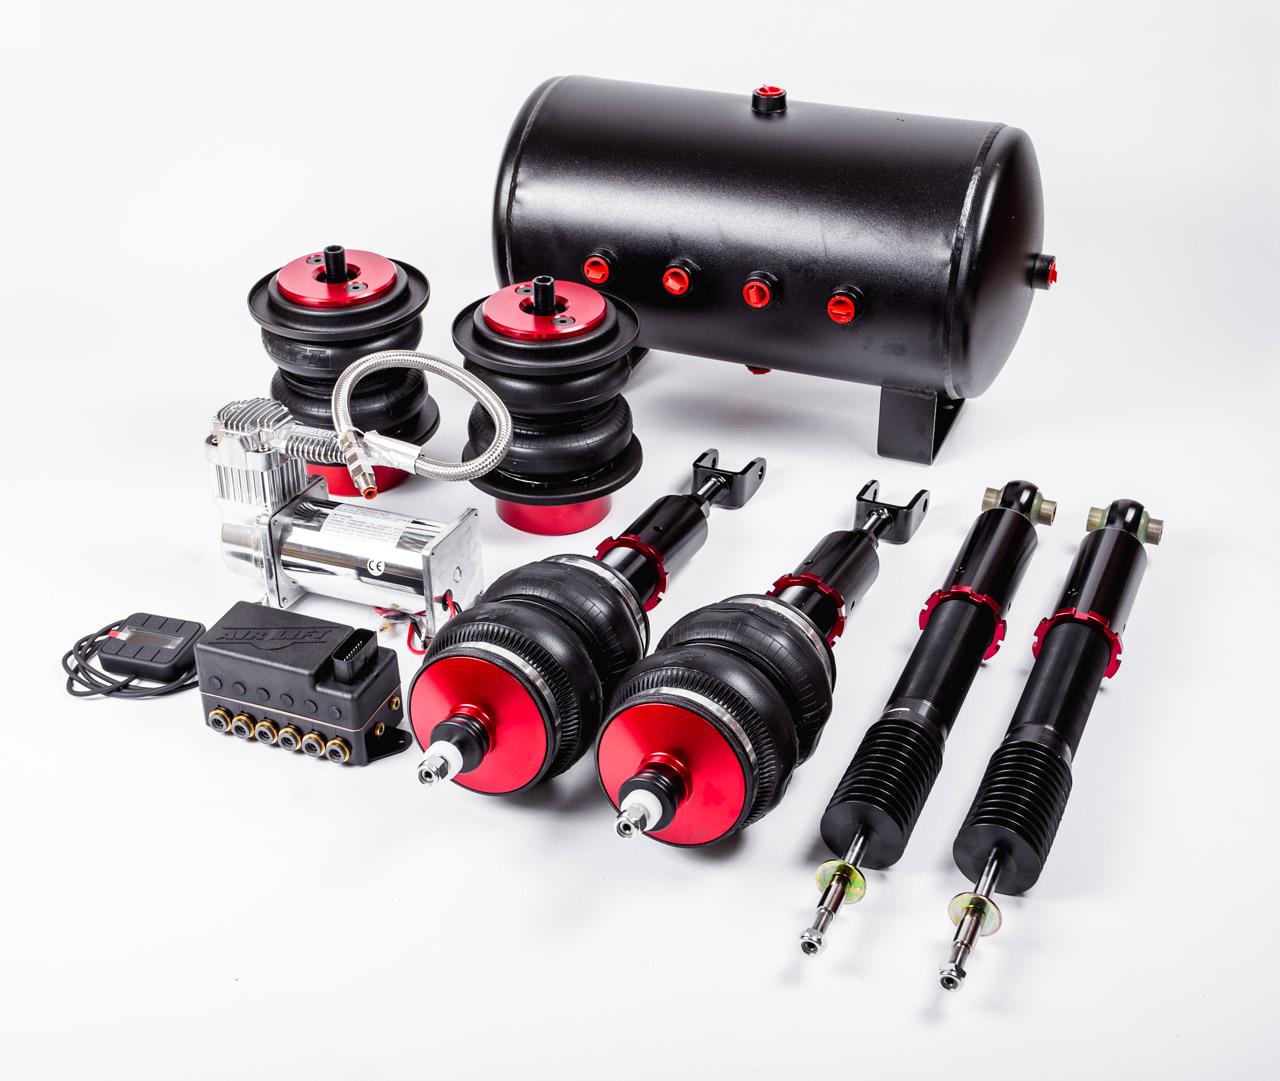 Air Lift Performance Audi A4 (B6/B7 Platform) air suspension kit